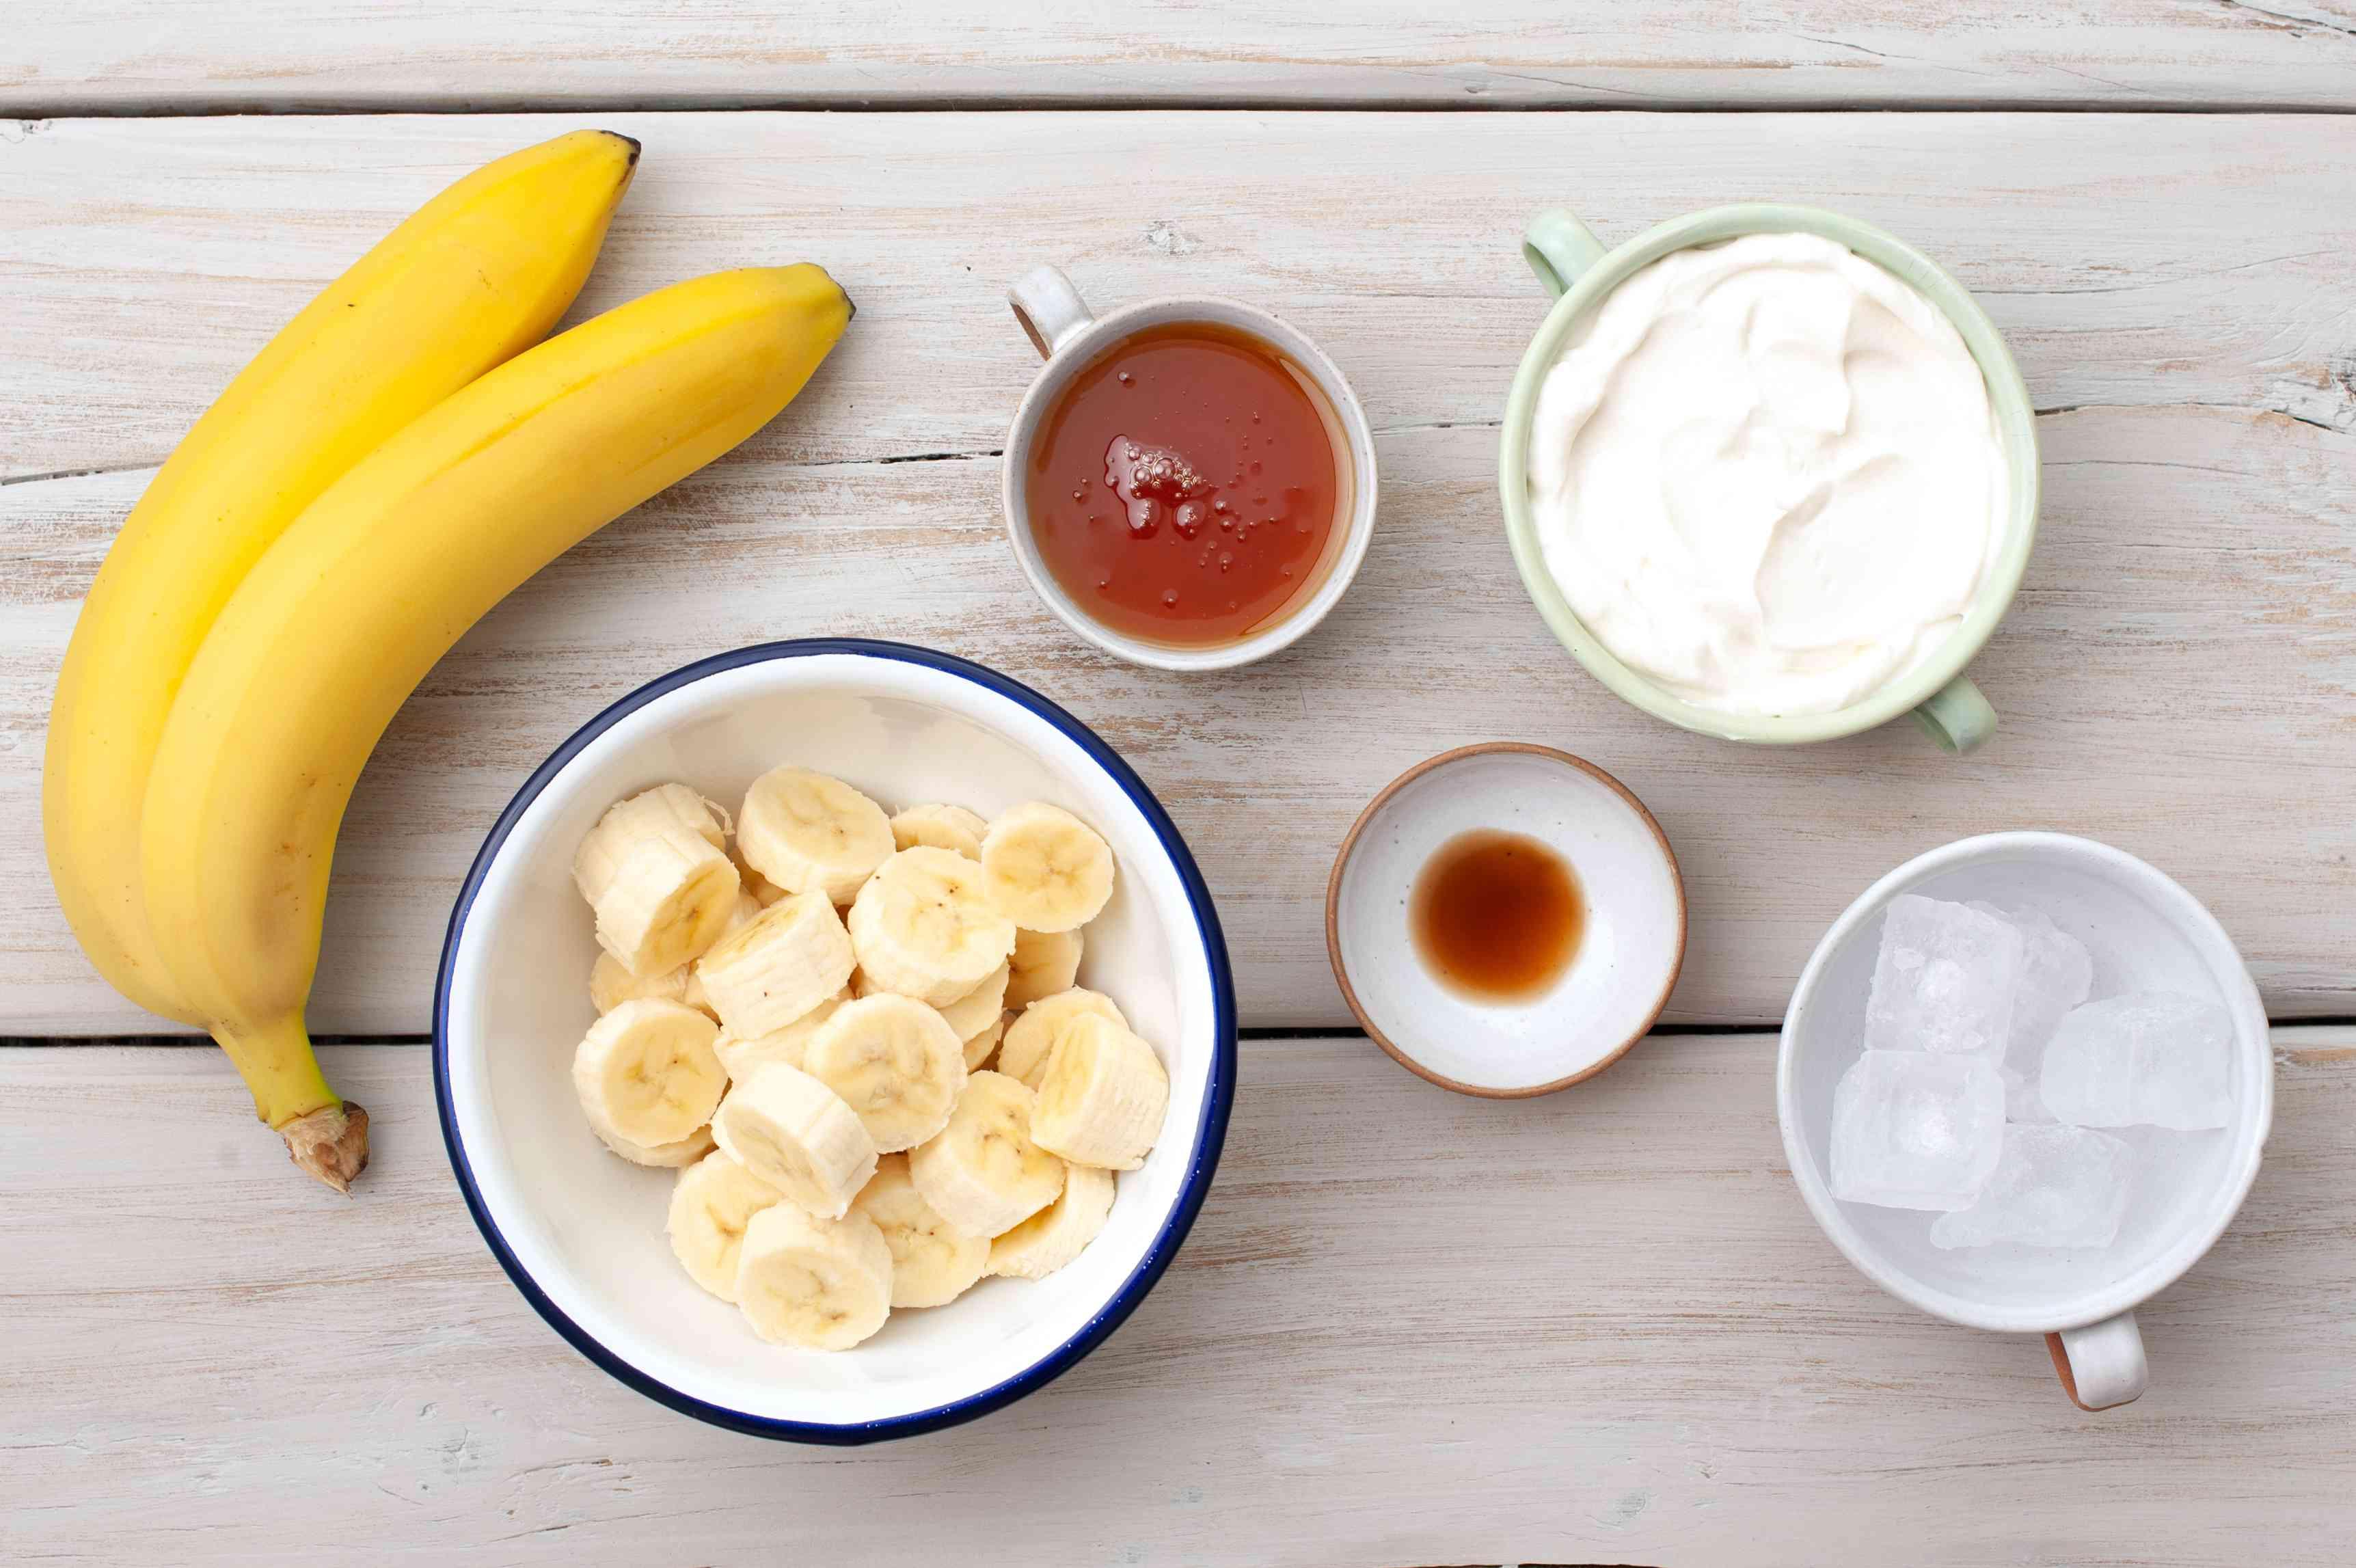 Ingredients for making a banana vanilla smoothie